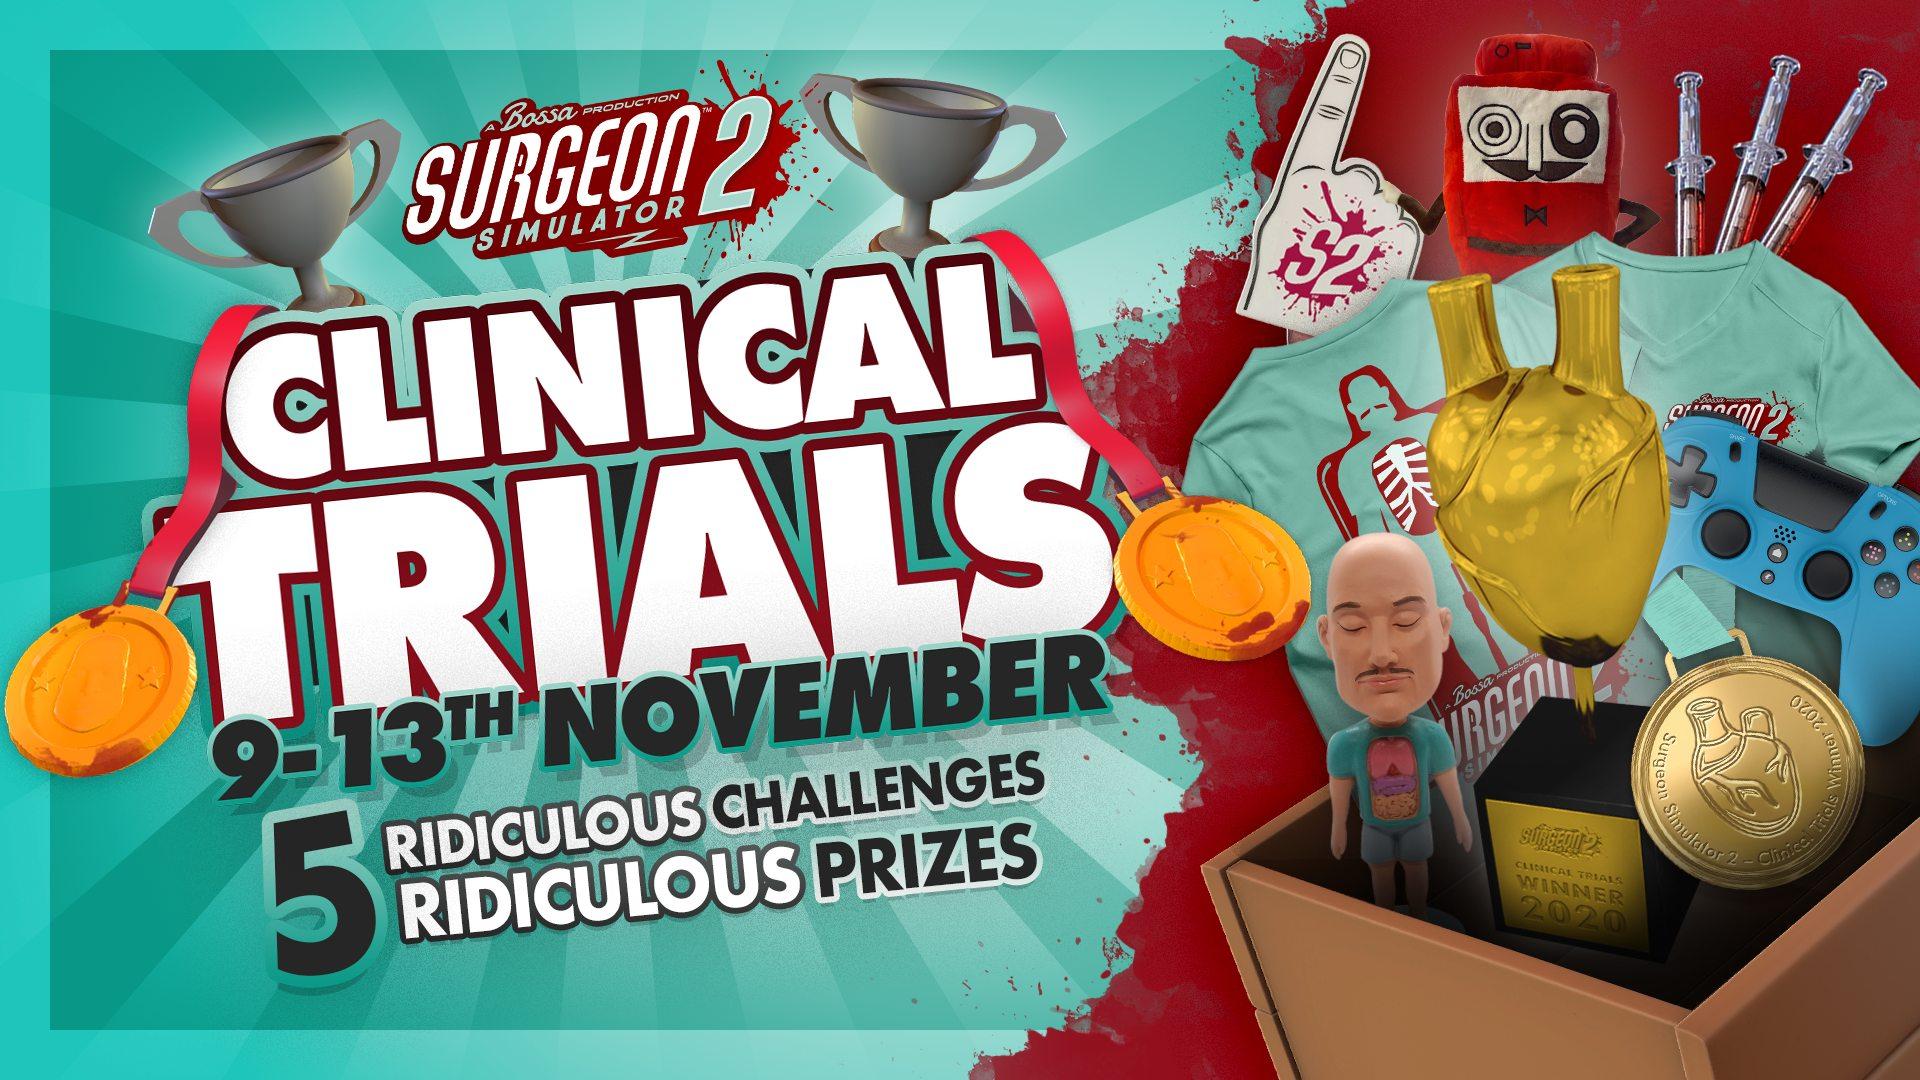 Surgeon Simulator 2 - Clinical Trials   Bossa Studios